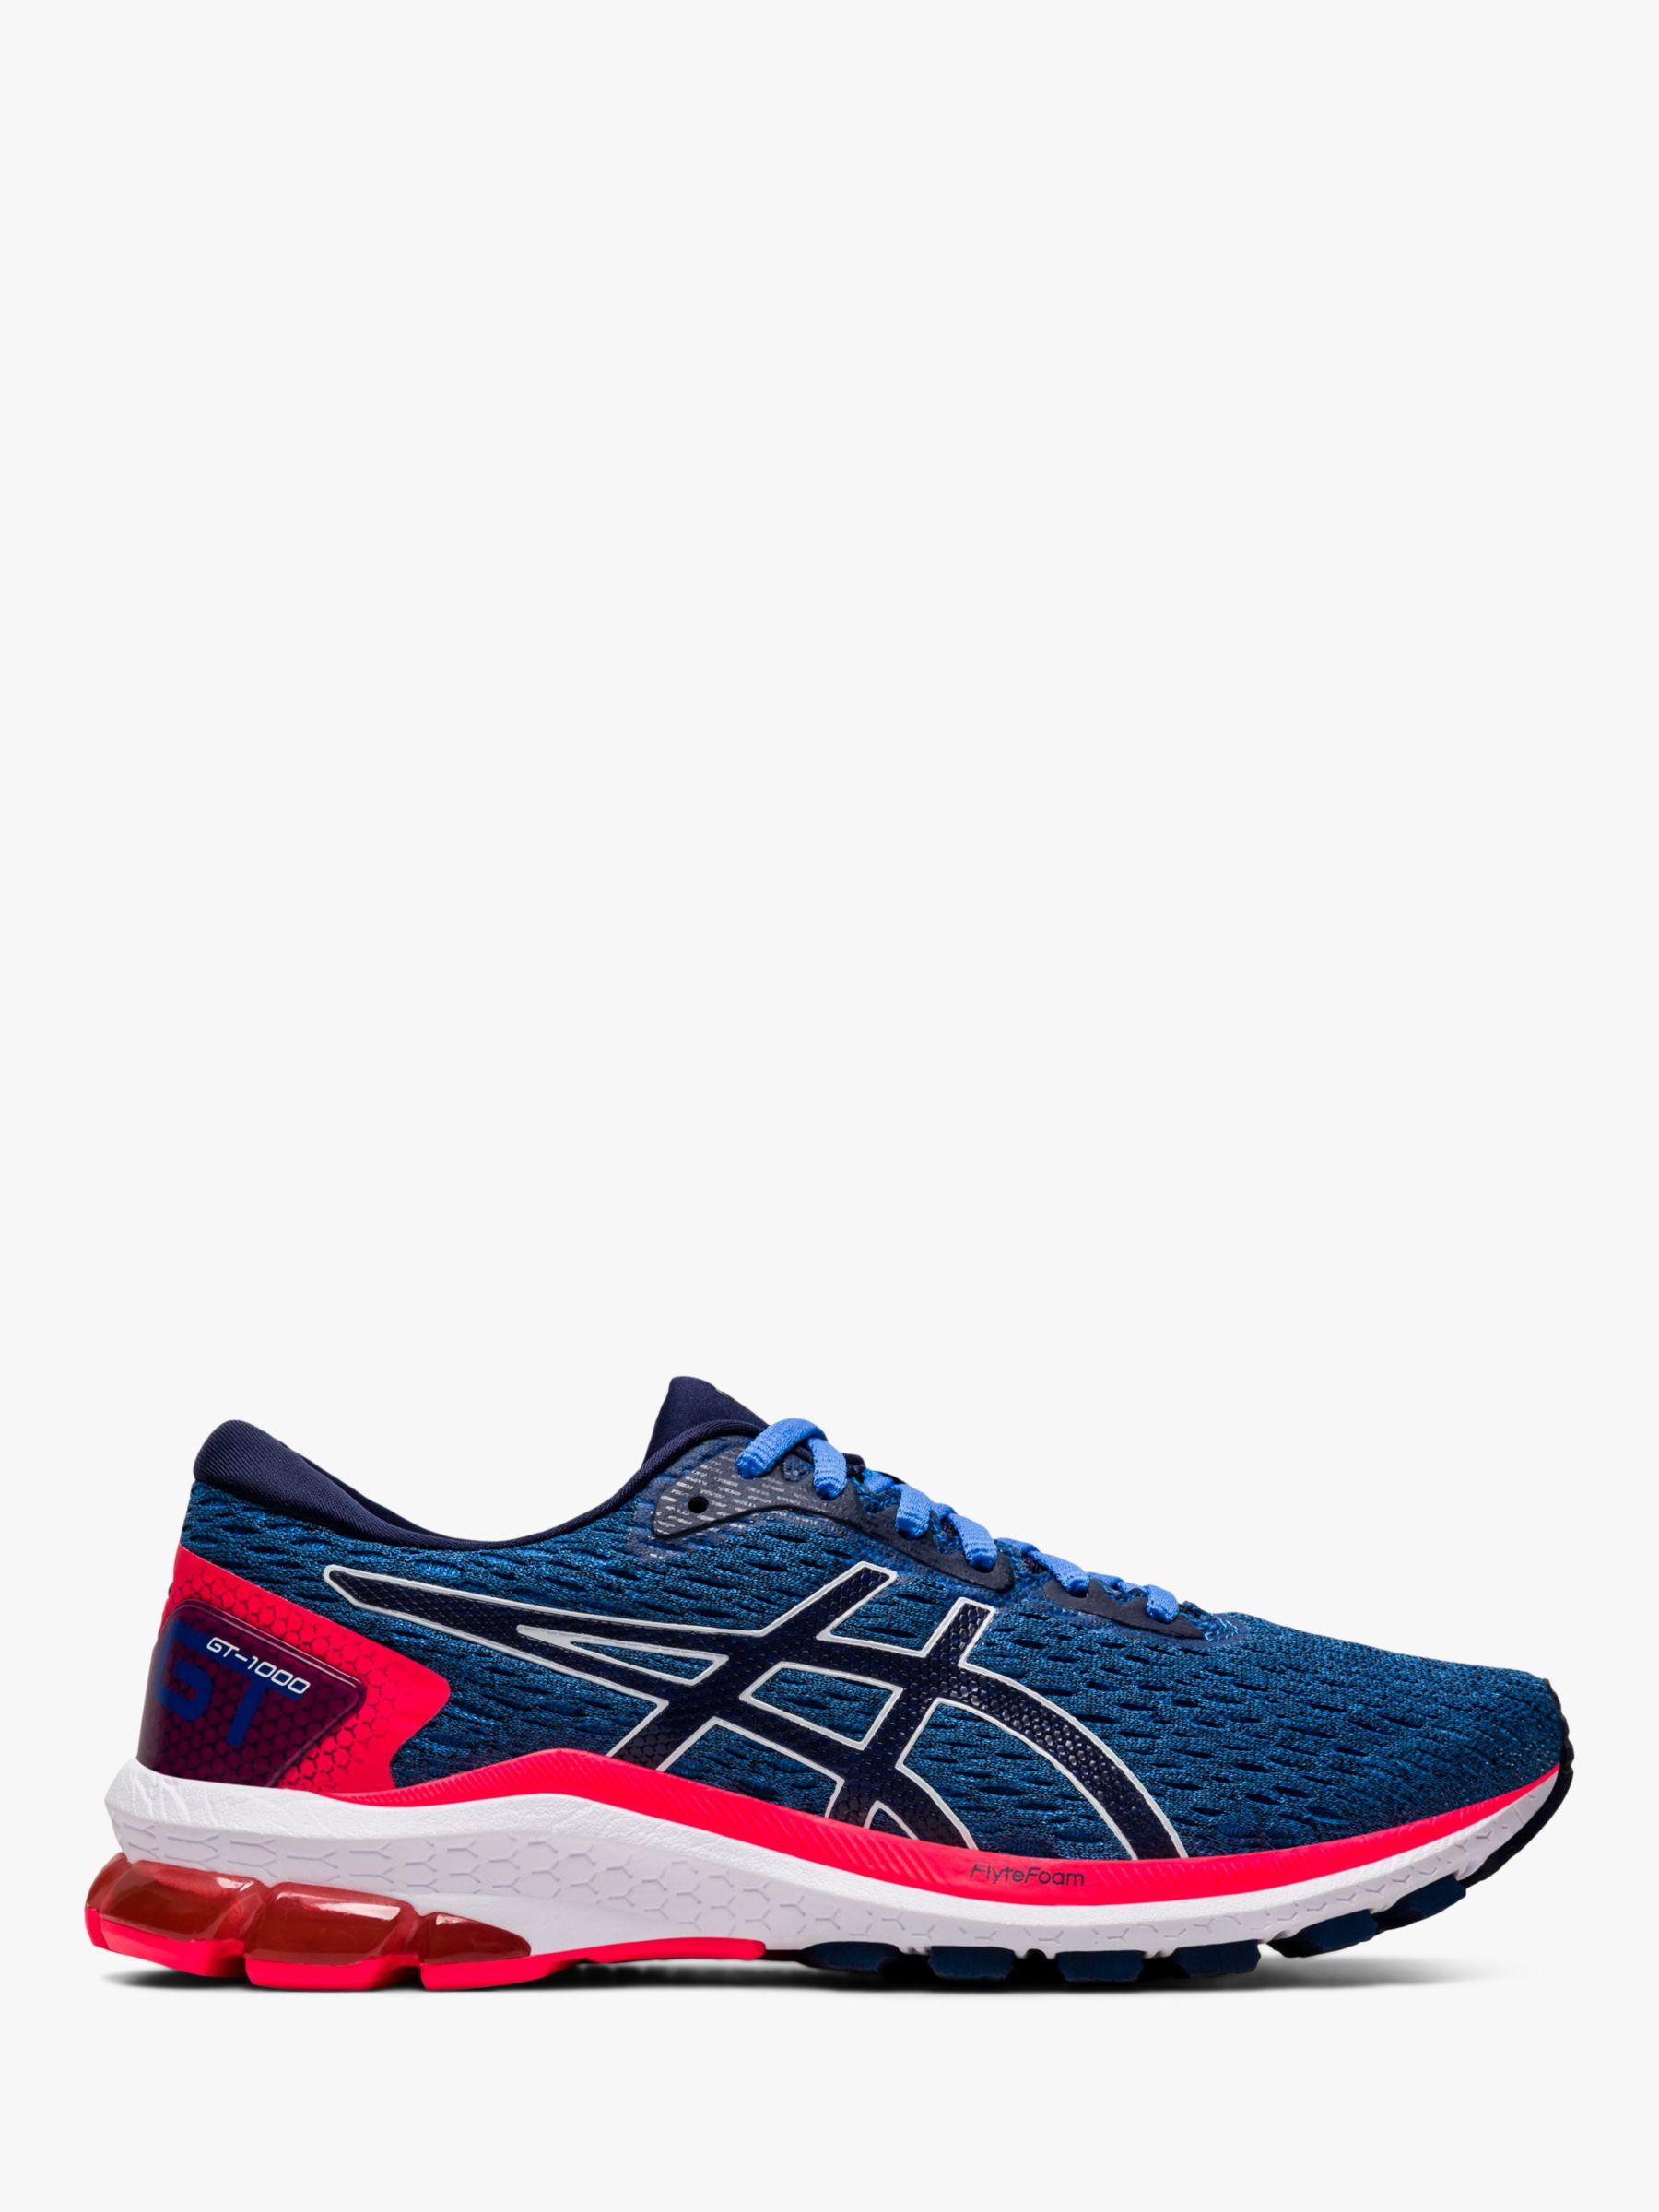 ASICS ASICS GT-1000 9 Women's Running Shoes, Blue Coast/Peacoat